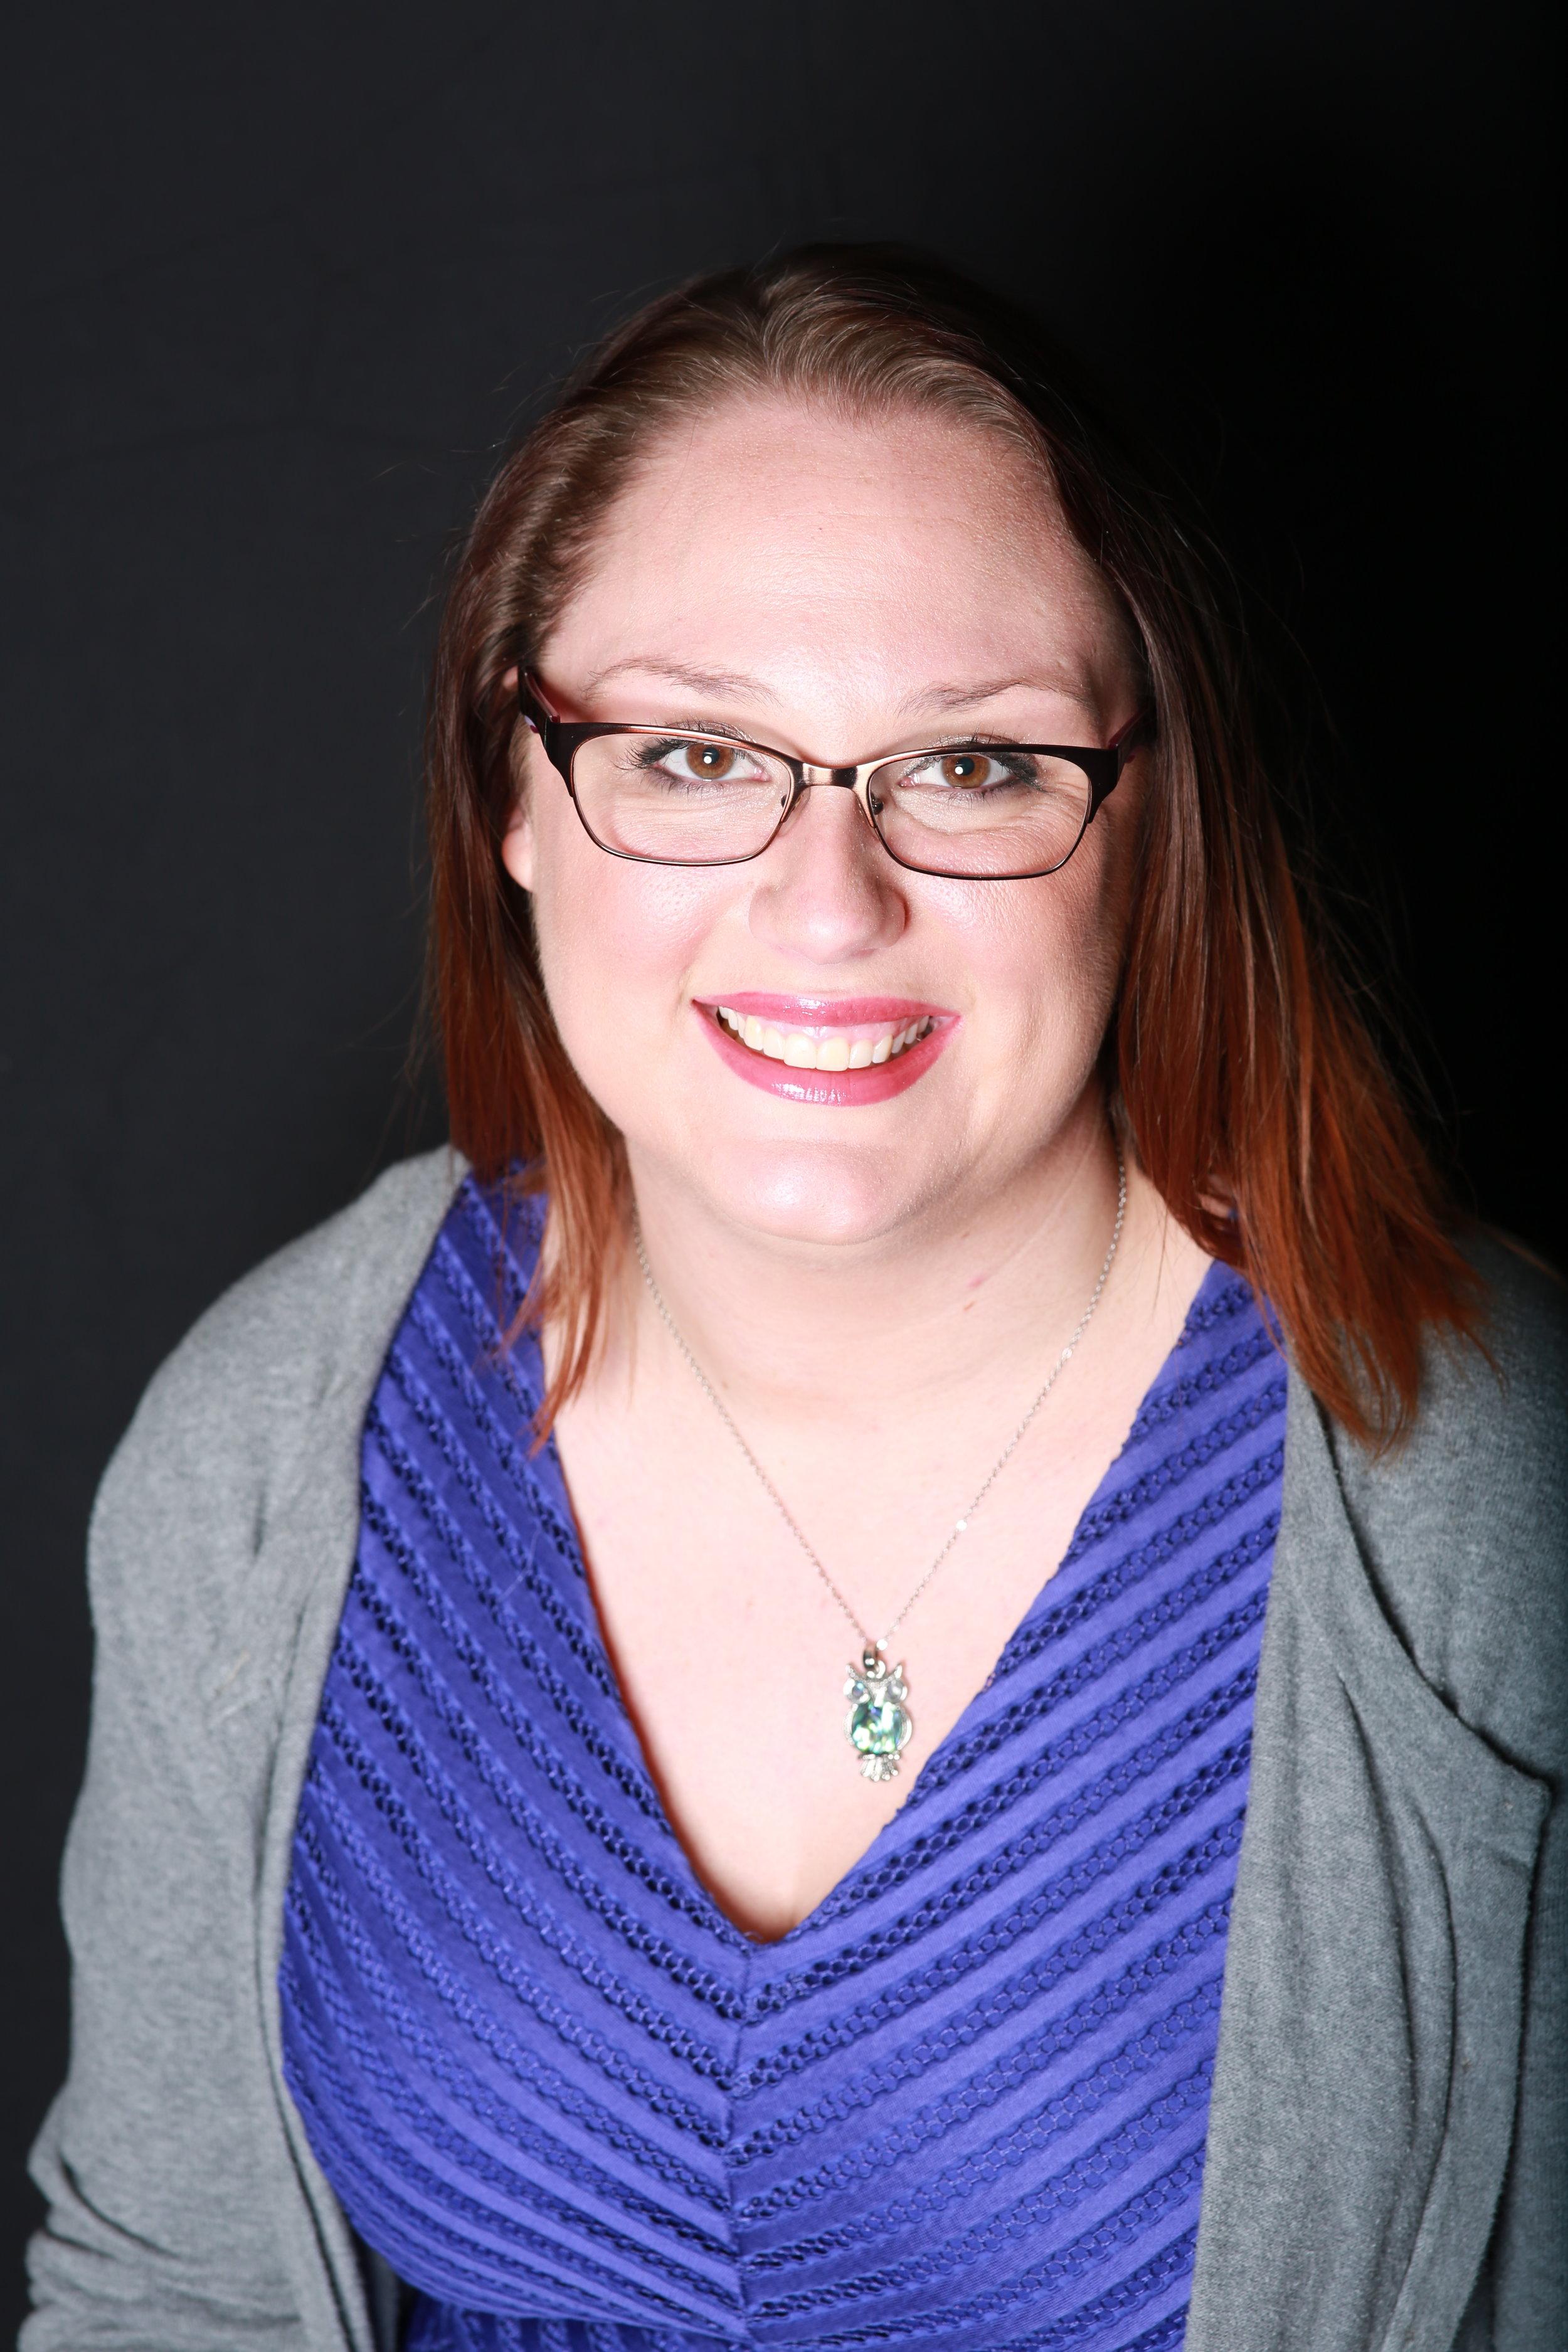 Alicia Allen, Math    Homeroom: Kennesaw State University